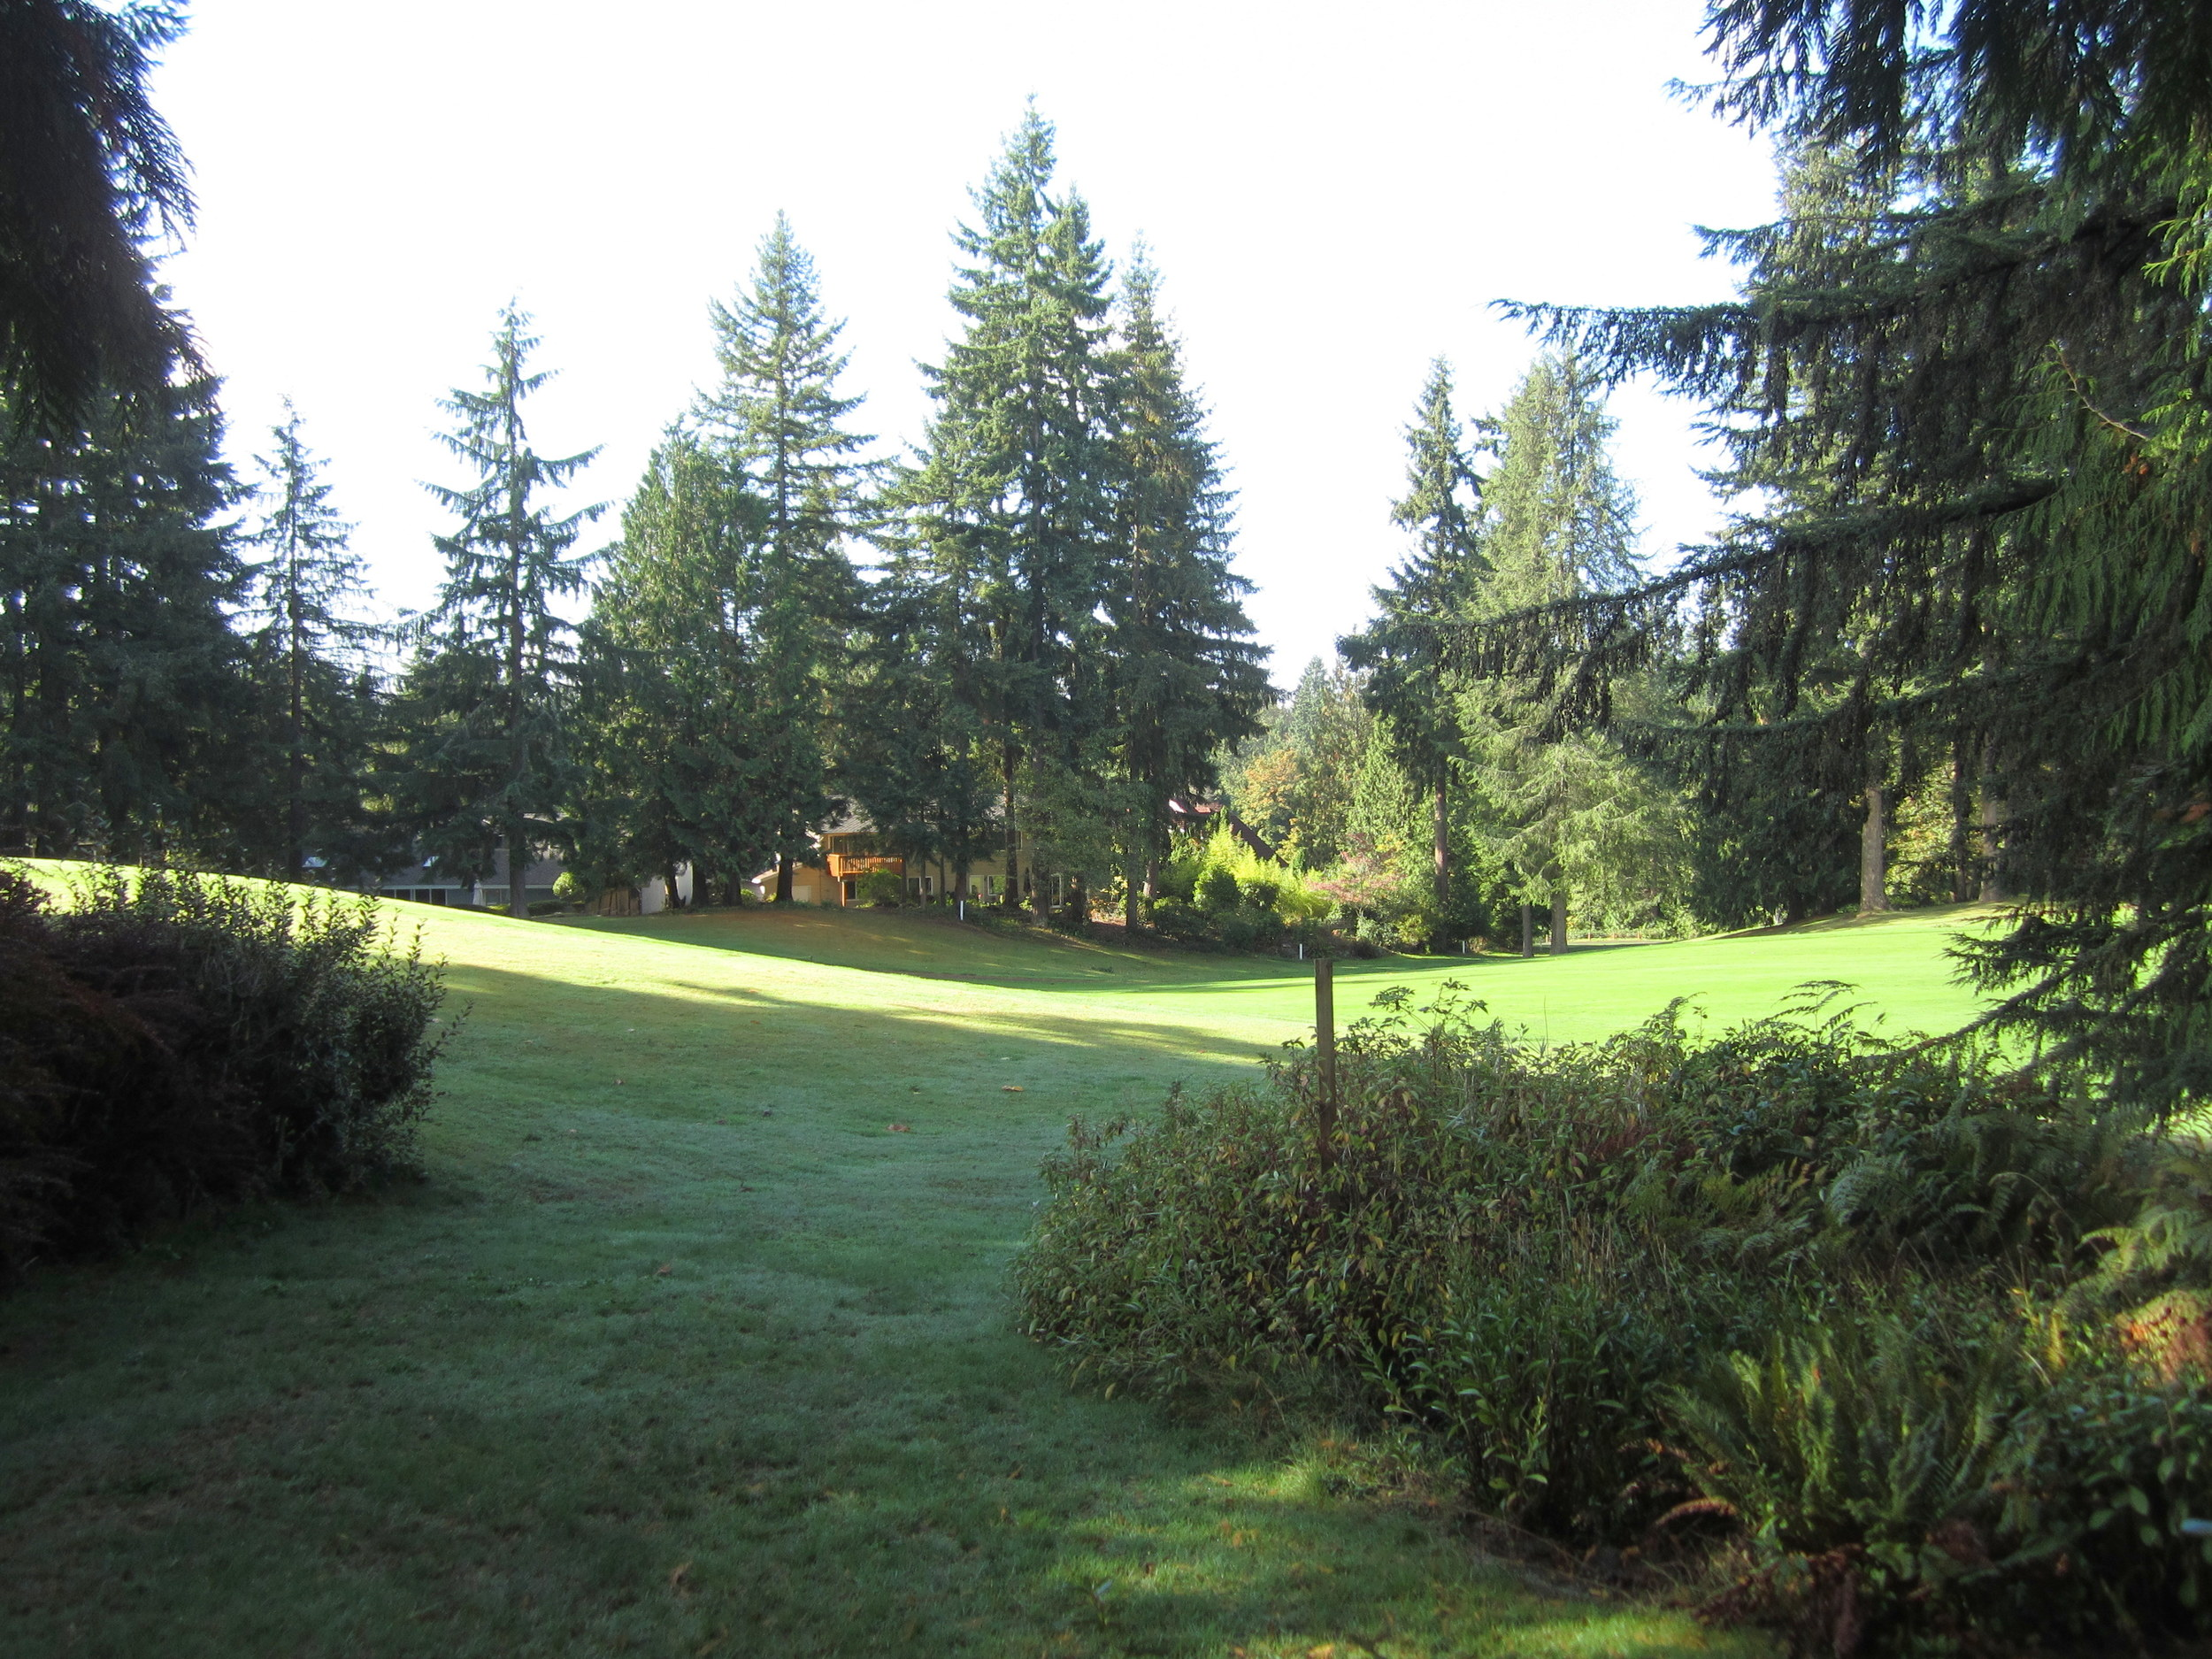 561-933522-golfcourseview.JPG